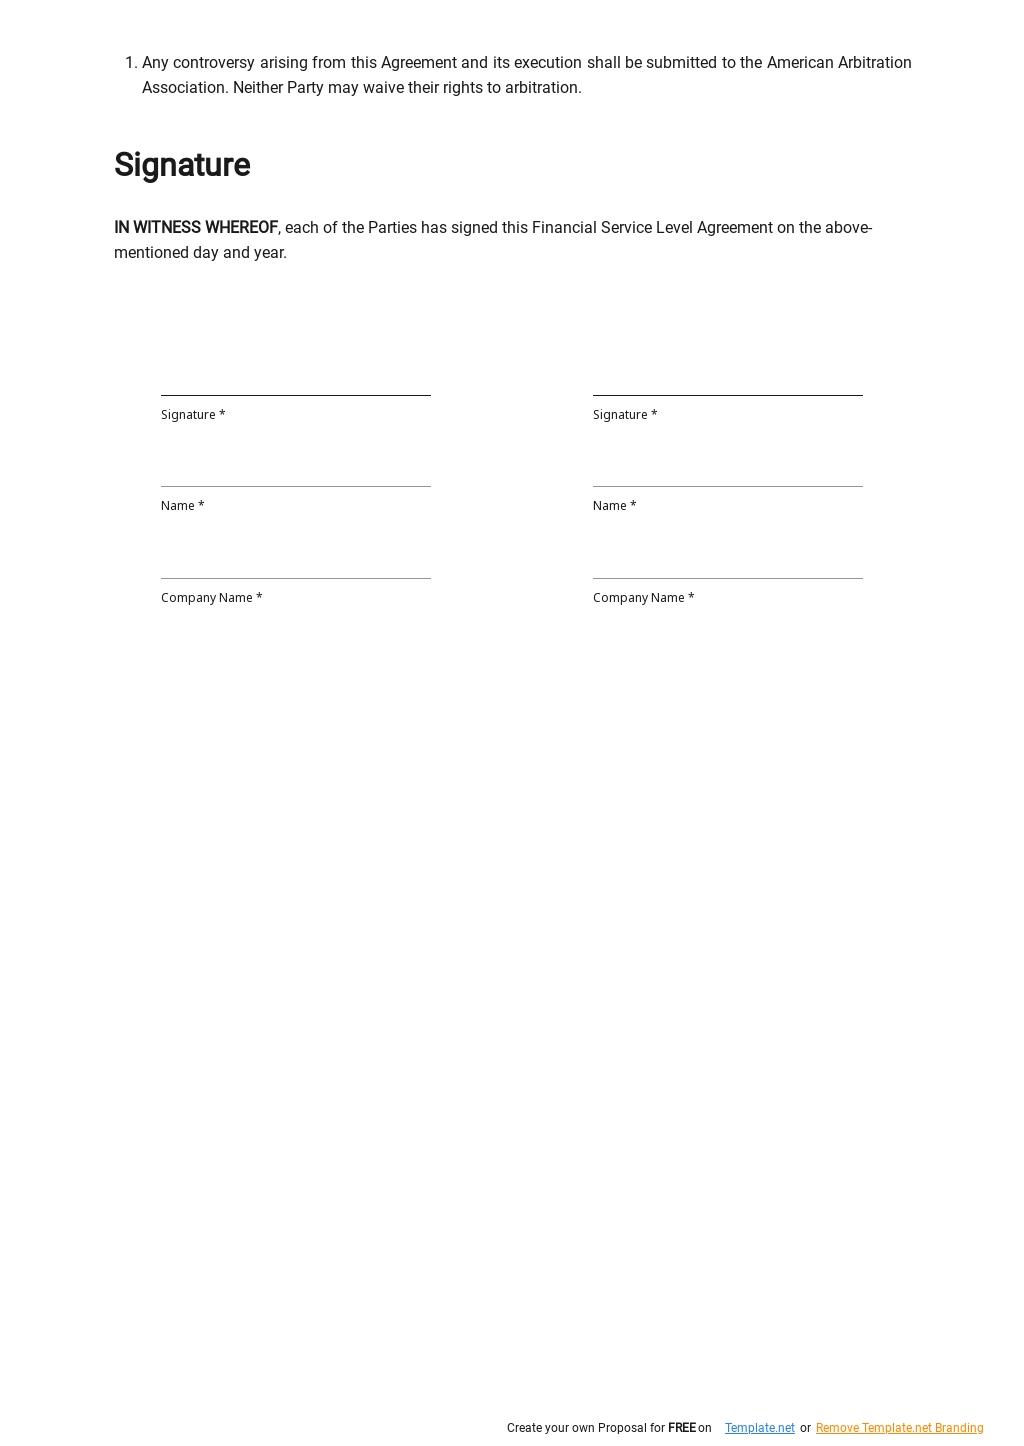 Financial Service Level Agreement Template  2.jpe